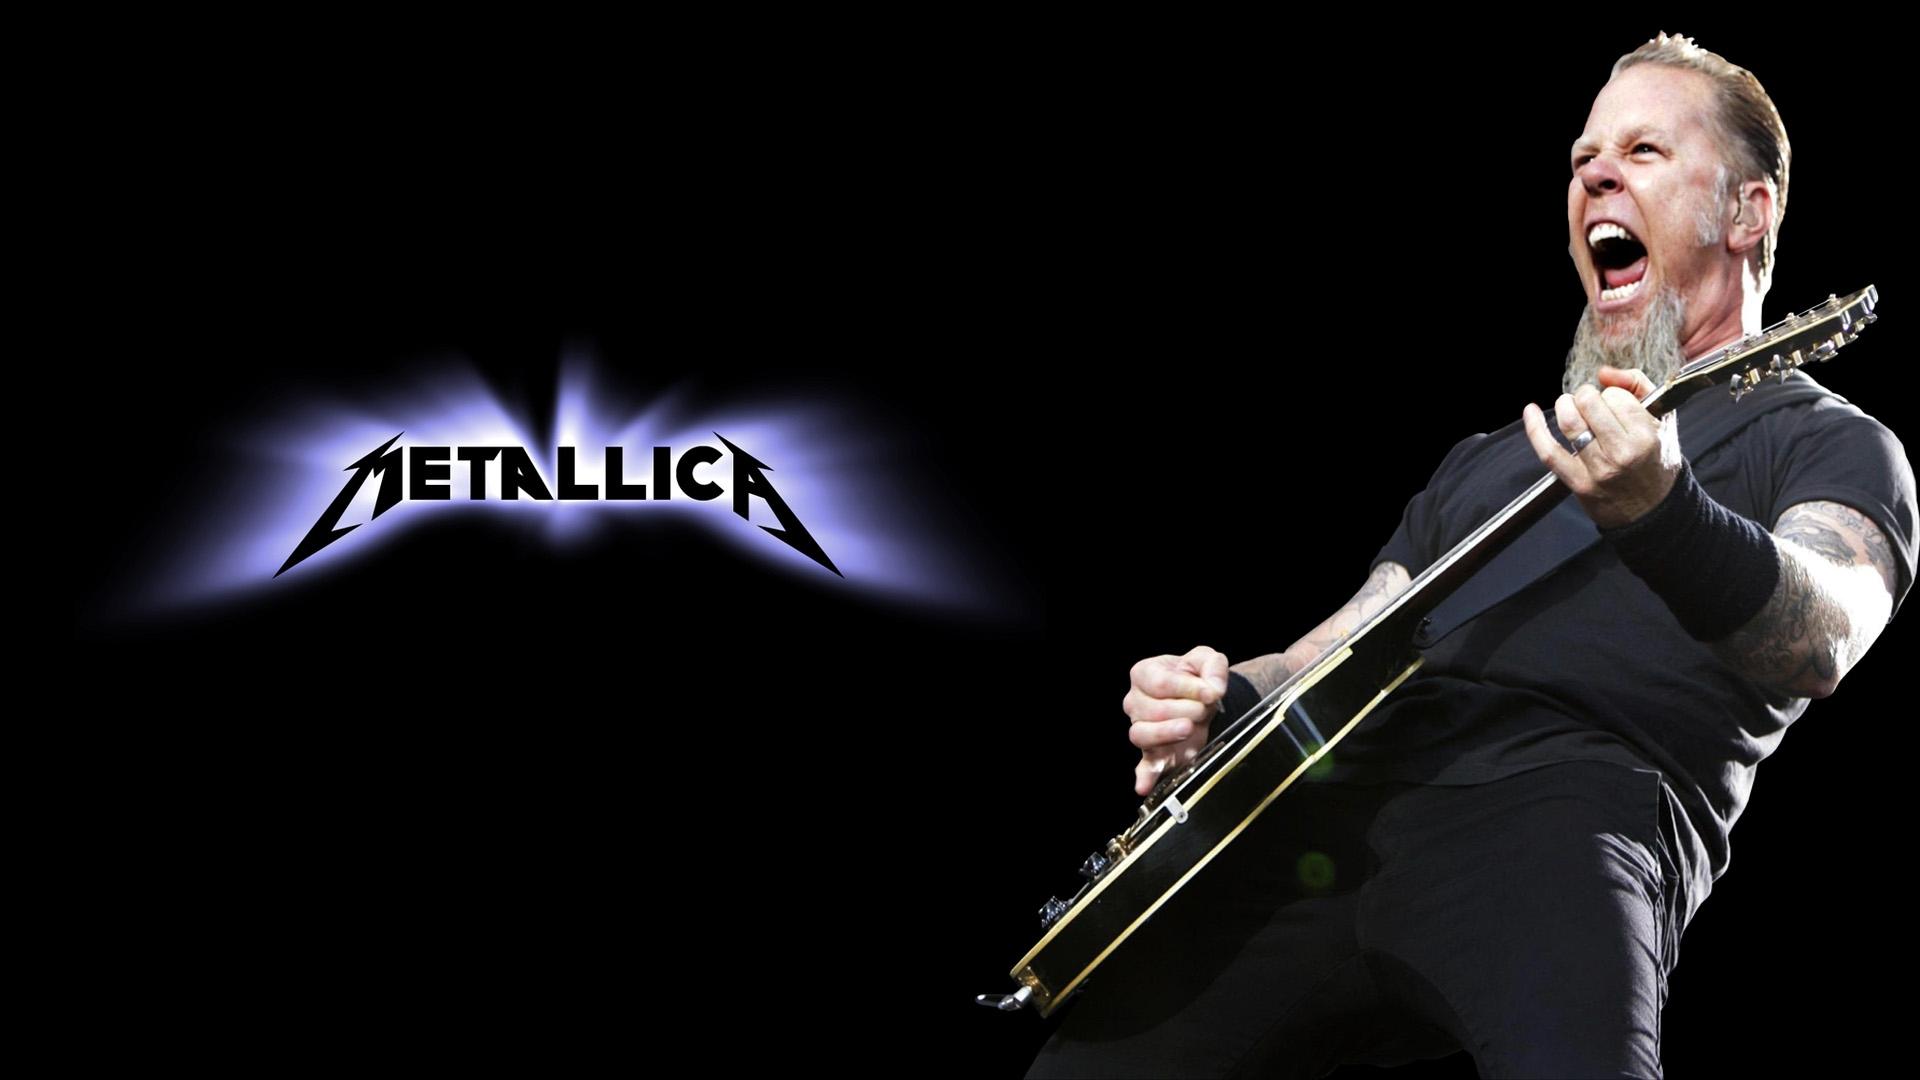 Wallpaper Musical Instrument Music Tattoo Musician Jazz Teeth Artist Metallica Guitarist Trumpet Look Performance Profession Bassist